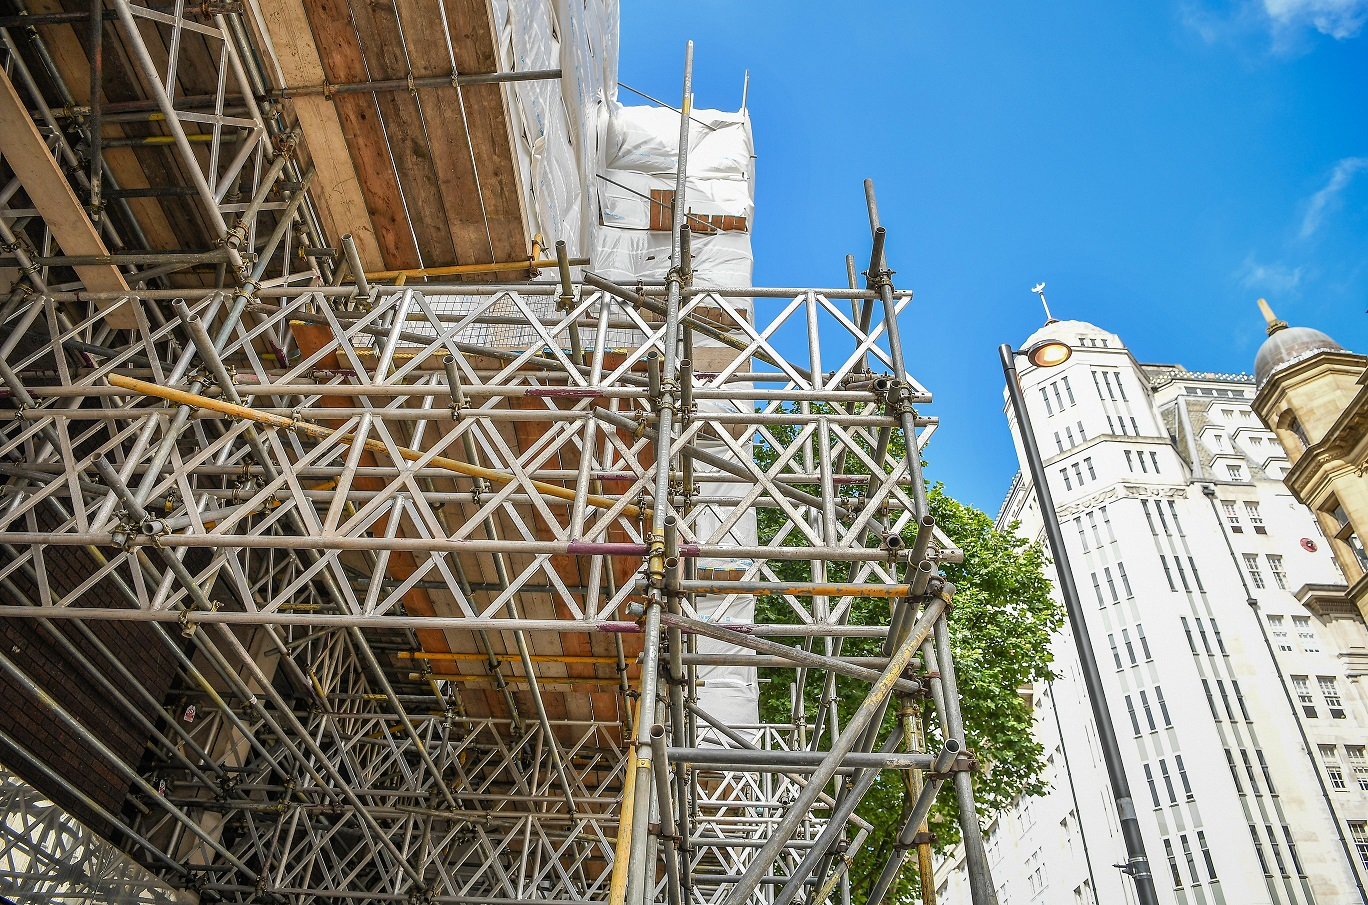 Improved scaffolding safety